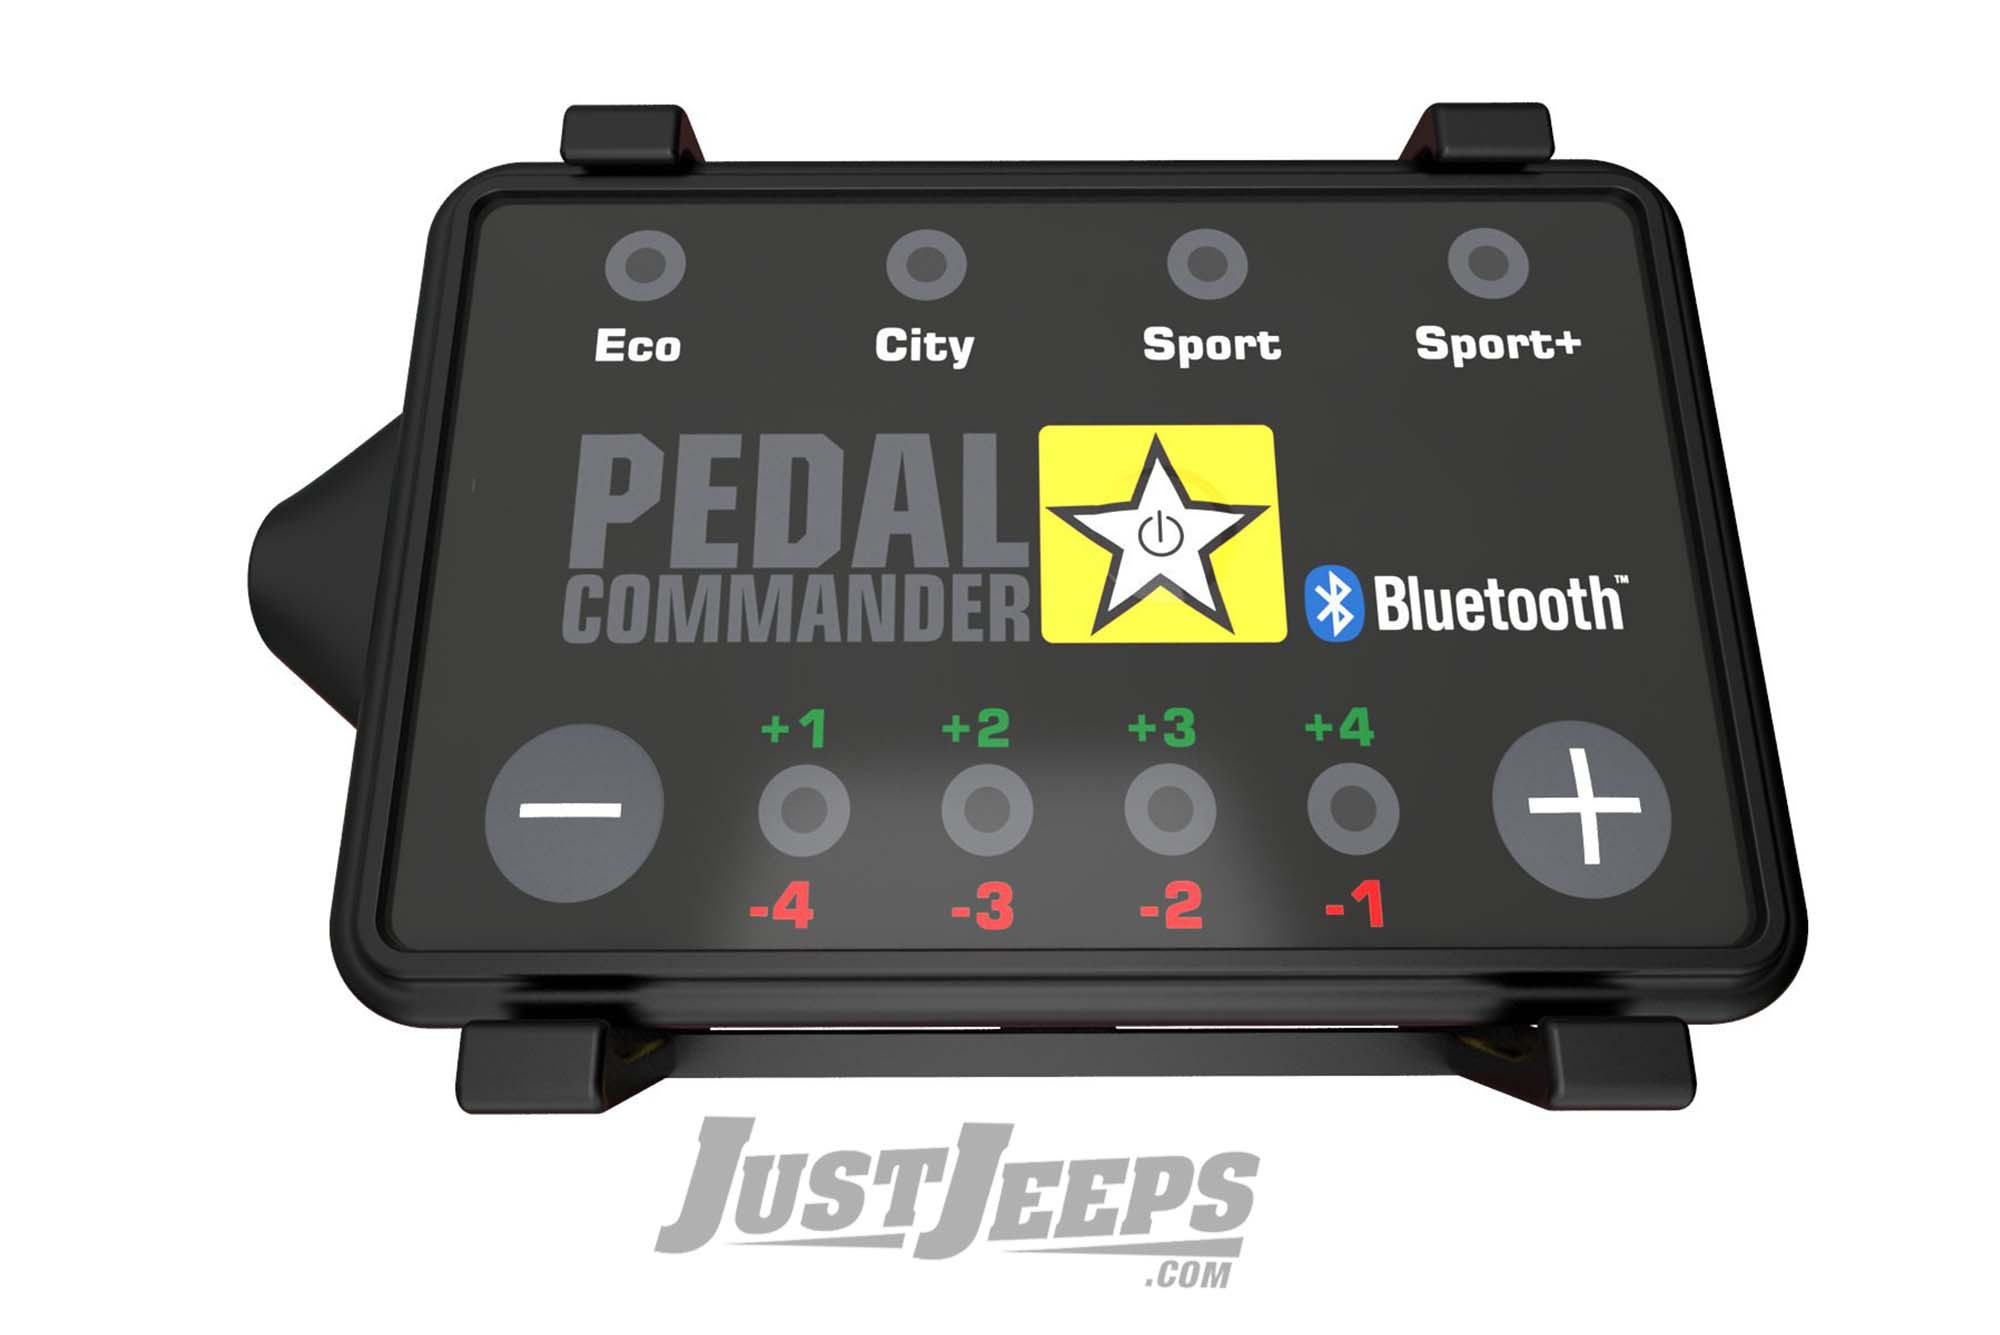 Pedal Commander Bluetooth Throttle Response Controller For 2007-18+ Jeep Gladiator JT & Wrangler JL 2 Door & Unlimited 4 Door Models